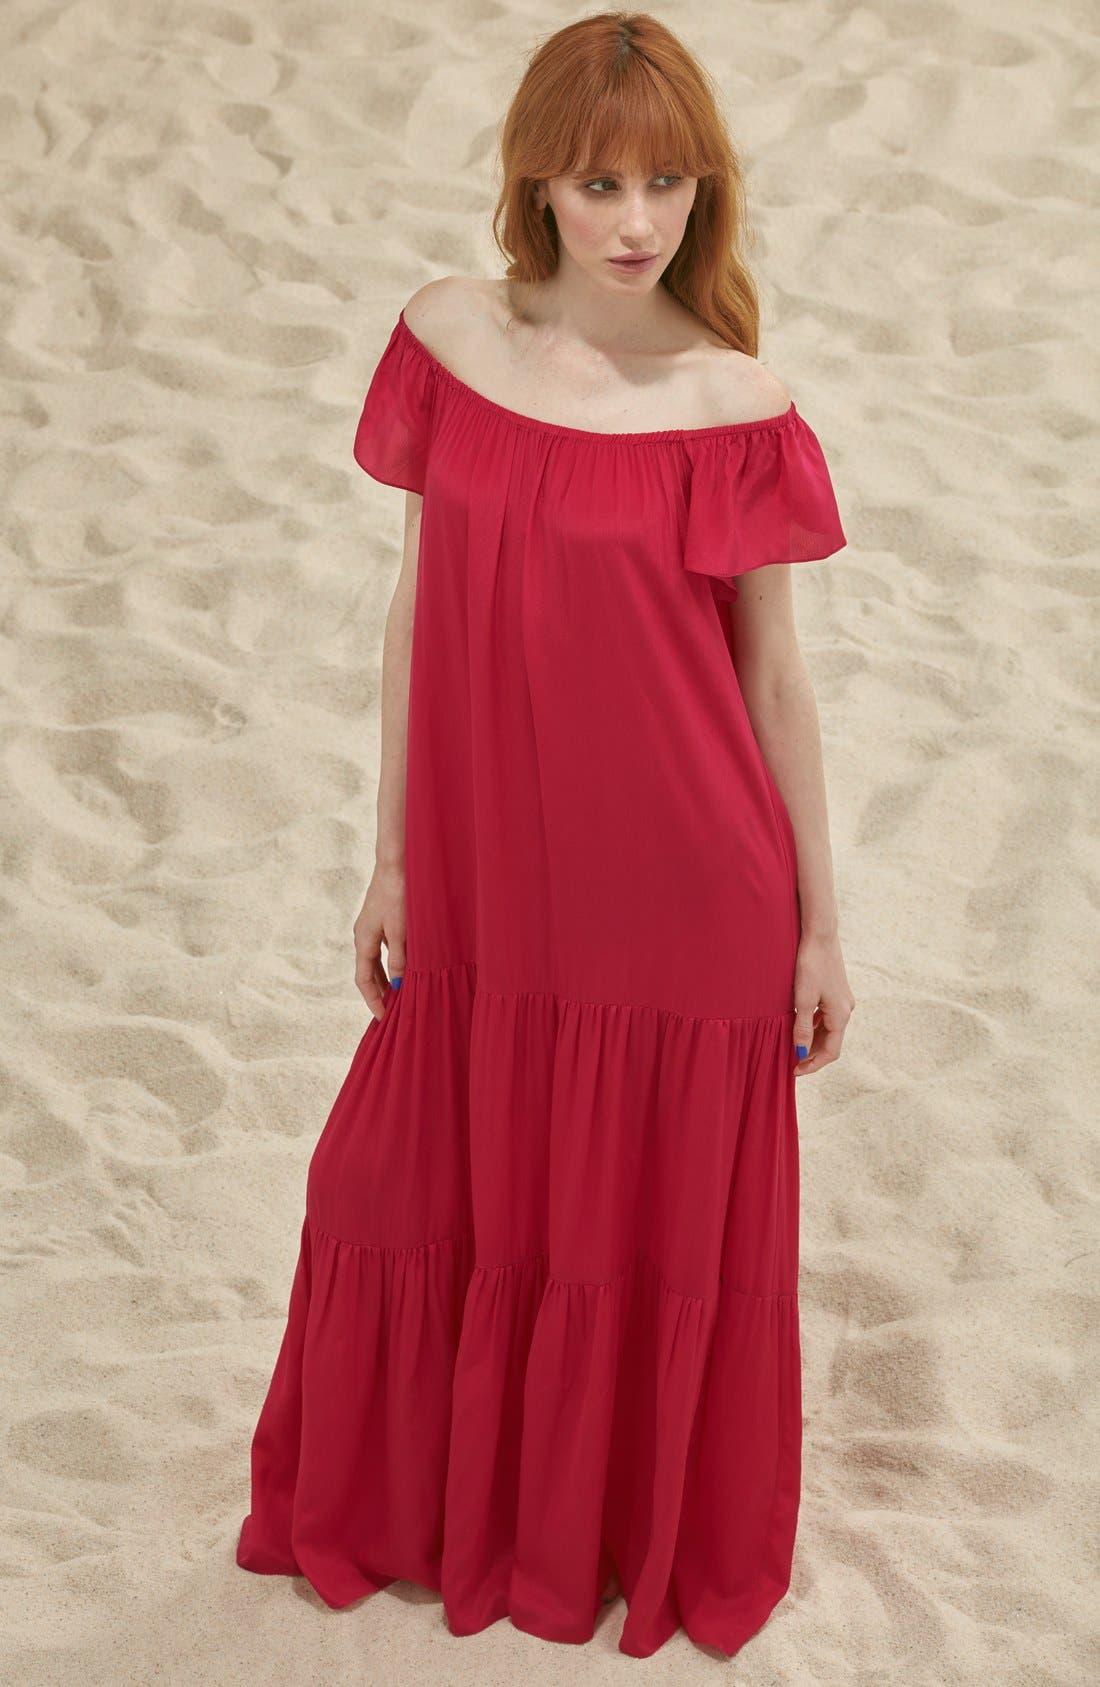 Alternate Image 1 Selected - Soler 'Thalia' Off the Shoulder Silk Maxi Dress